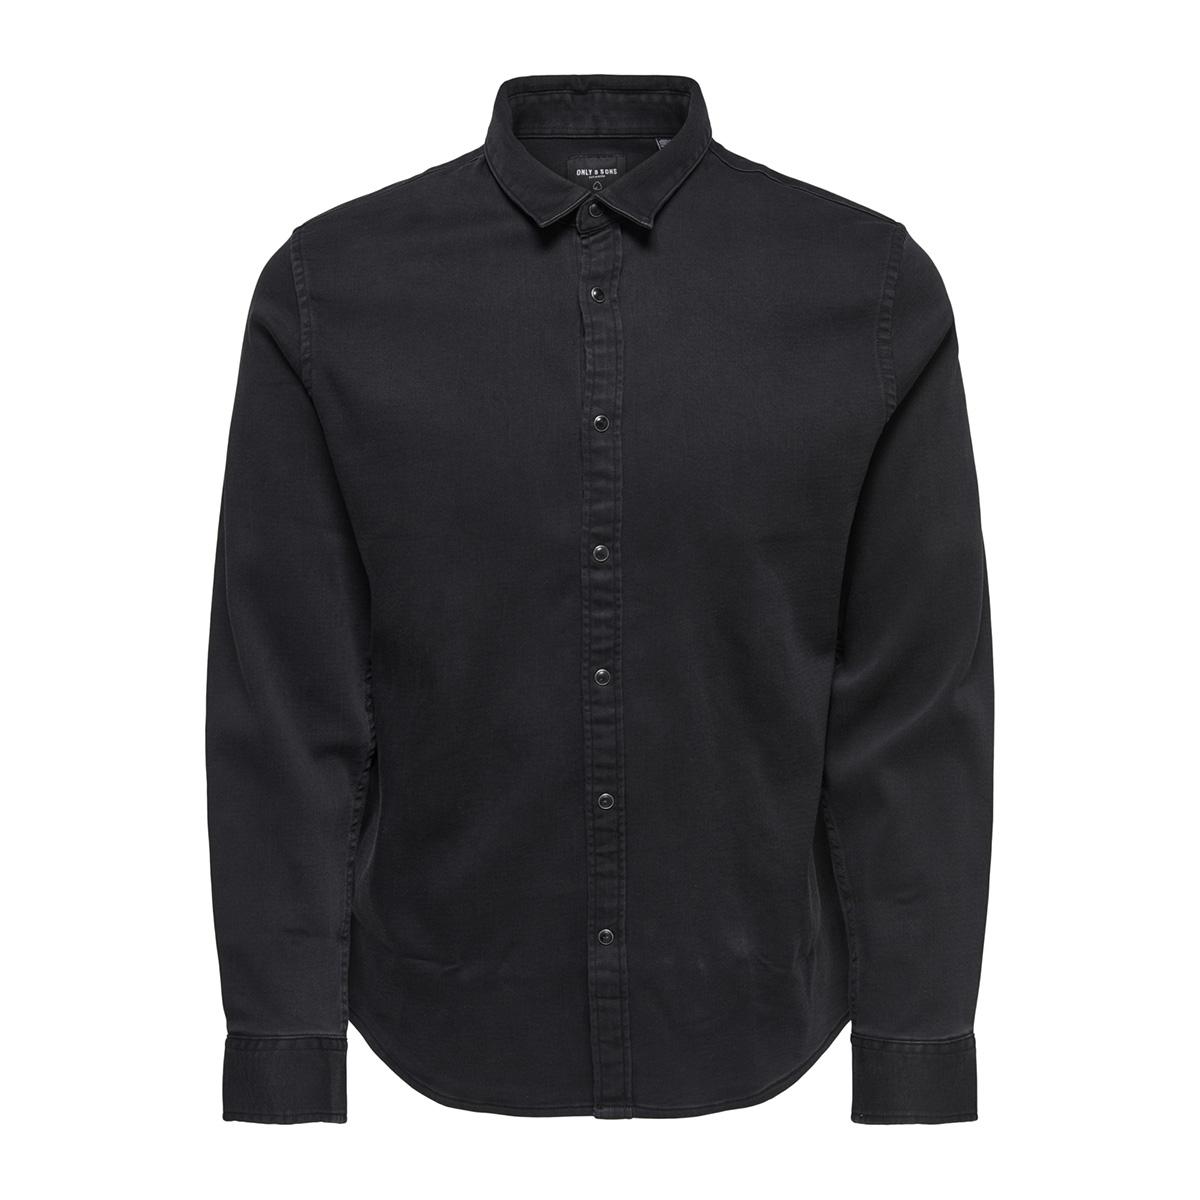 onsole ls jog denim shirt 22011179 only & sons overhemd dark grey denim